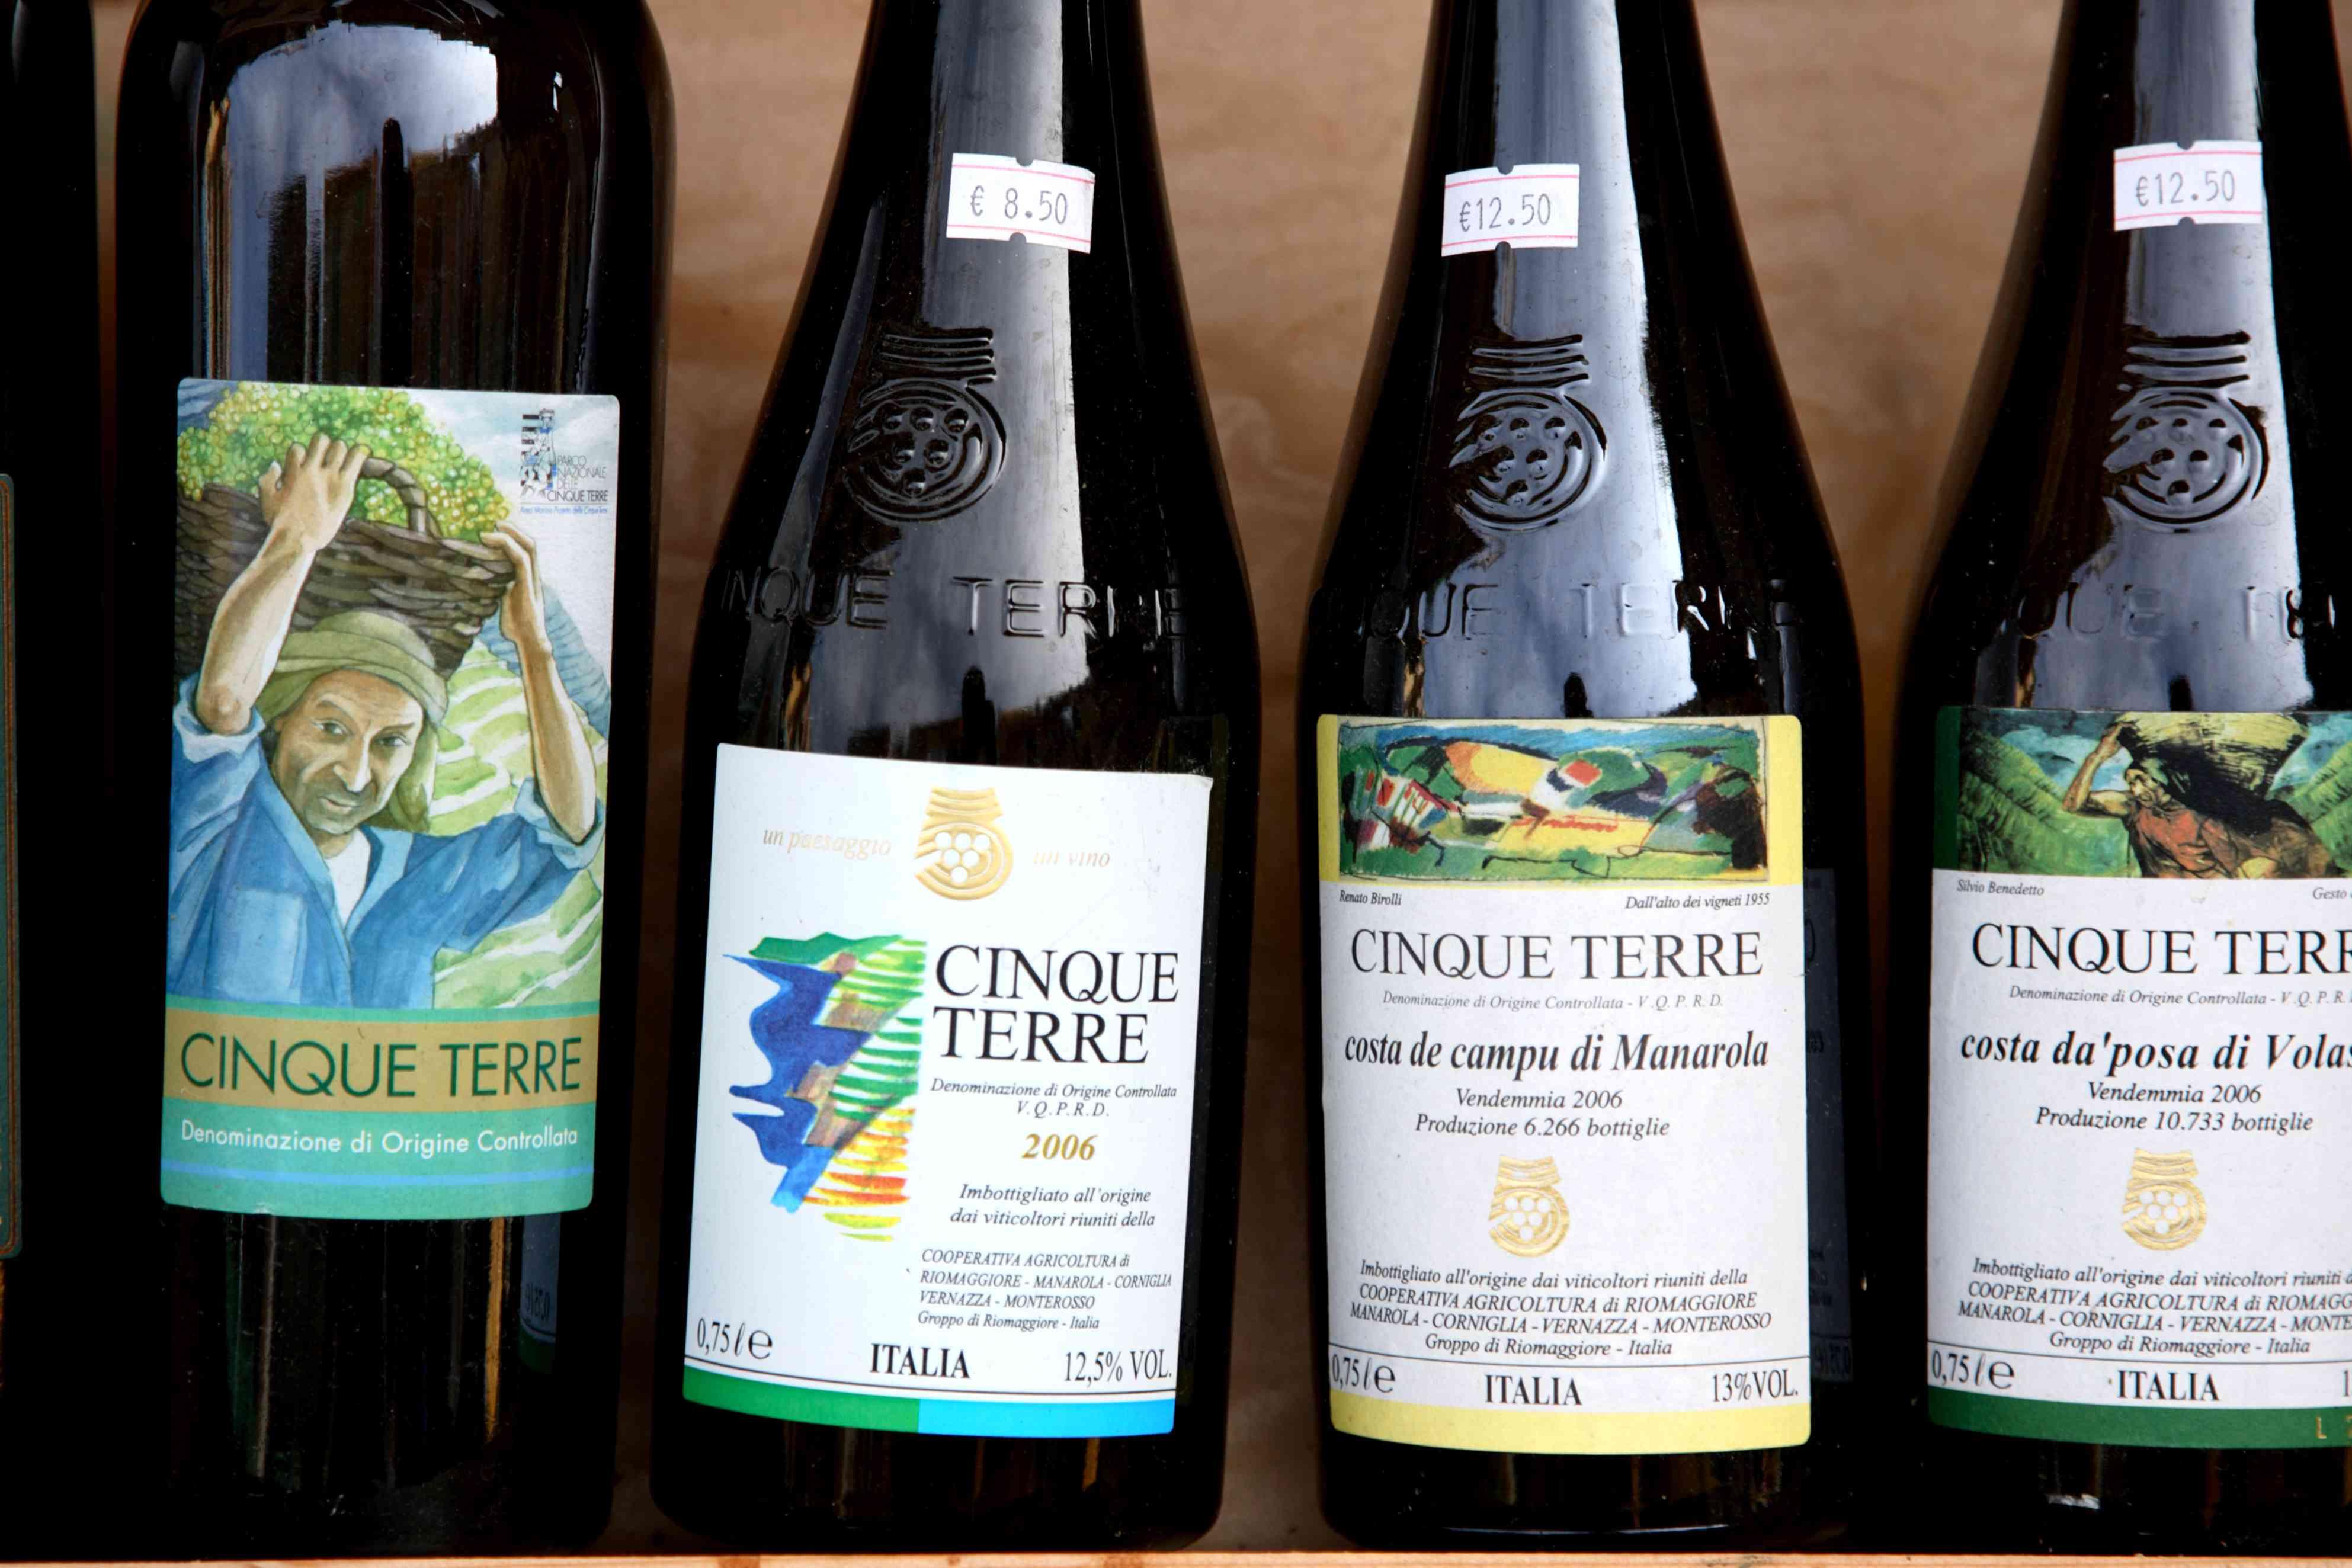 Bottles of wine produced in Cinque Terre region.